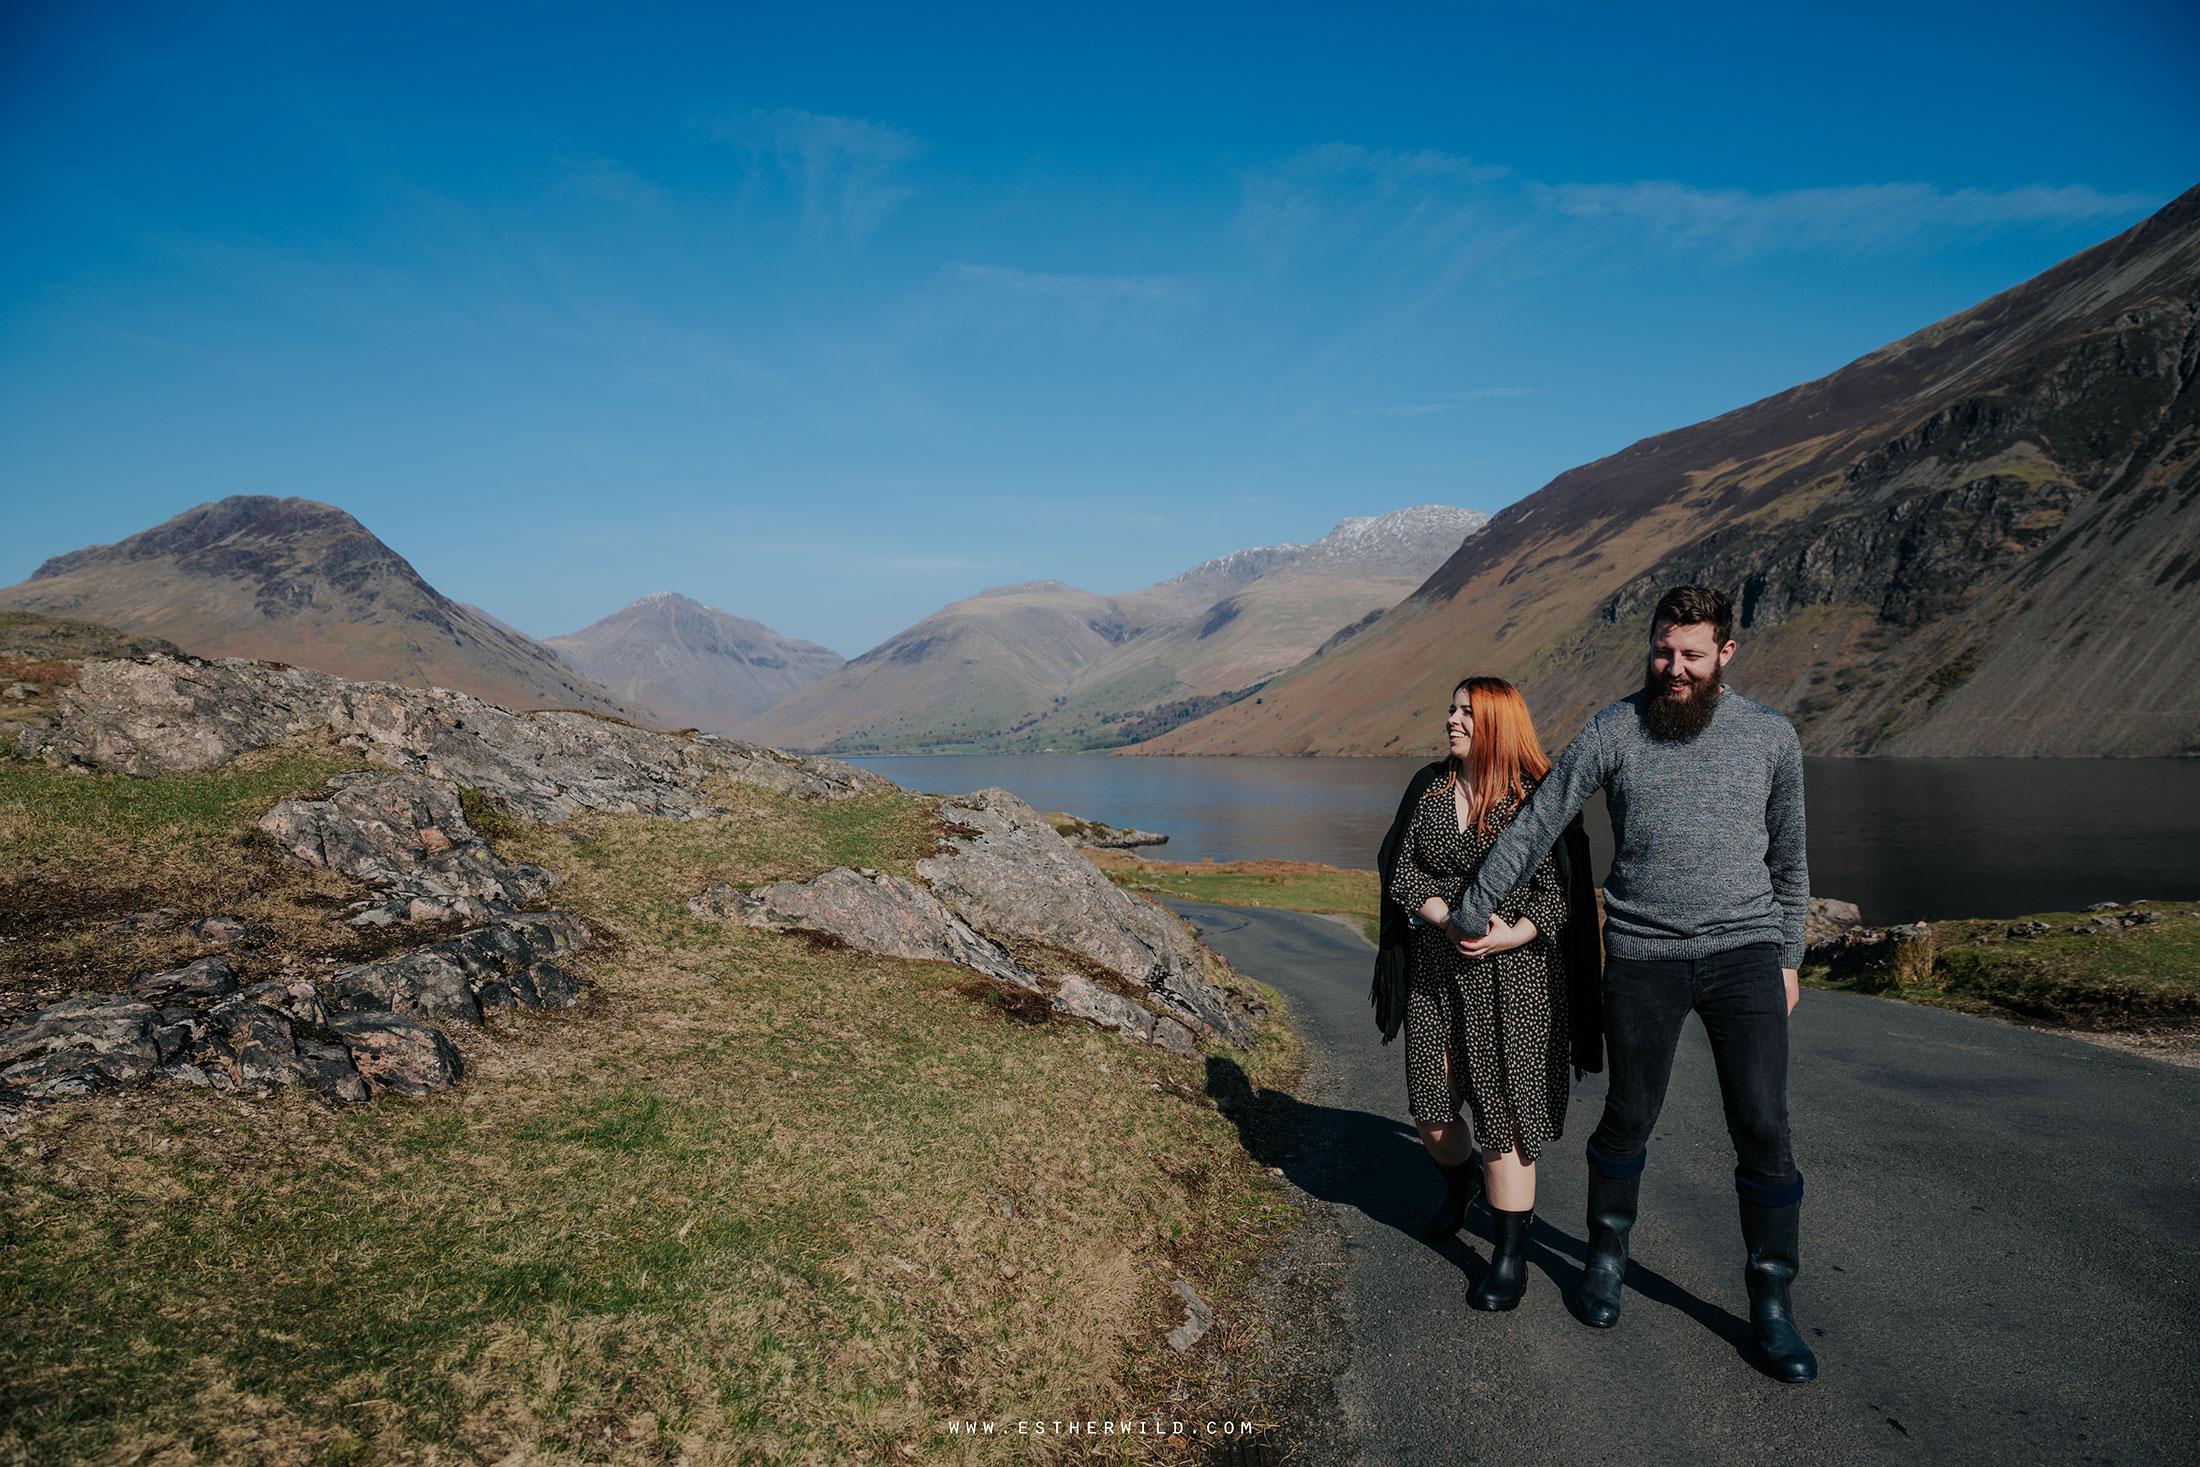 Cumbria_Lake_District_Wasdale_Wedding_Photographer_Destination_Engagement_Anniversary_Esther_Wild_IMG_3380.jpg